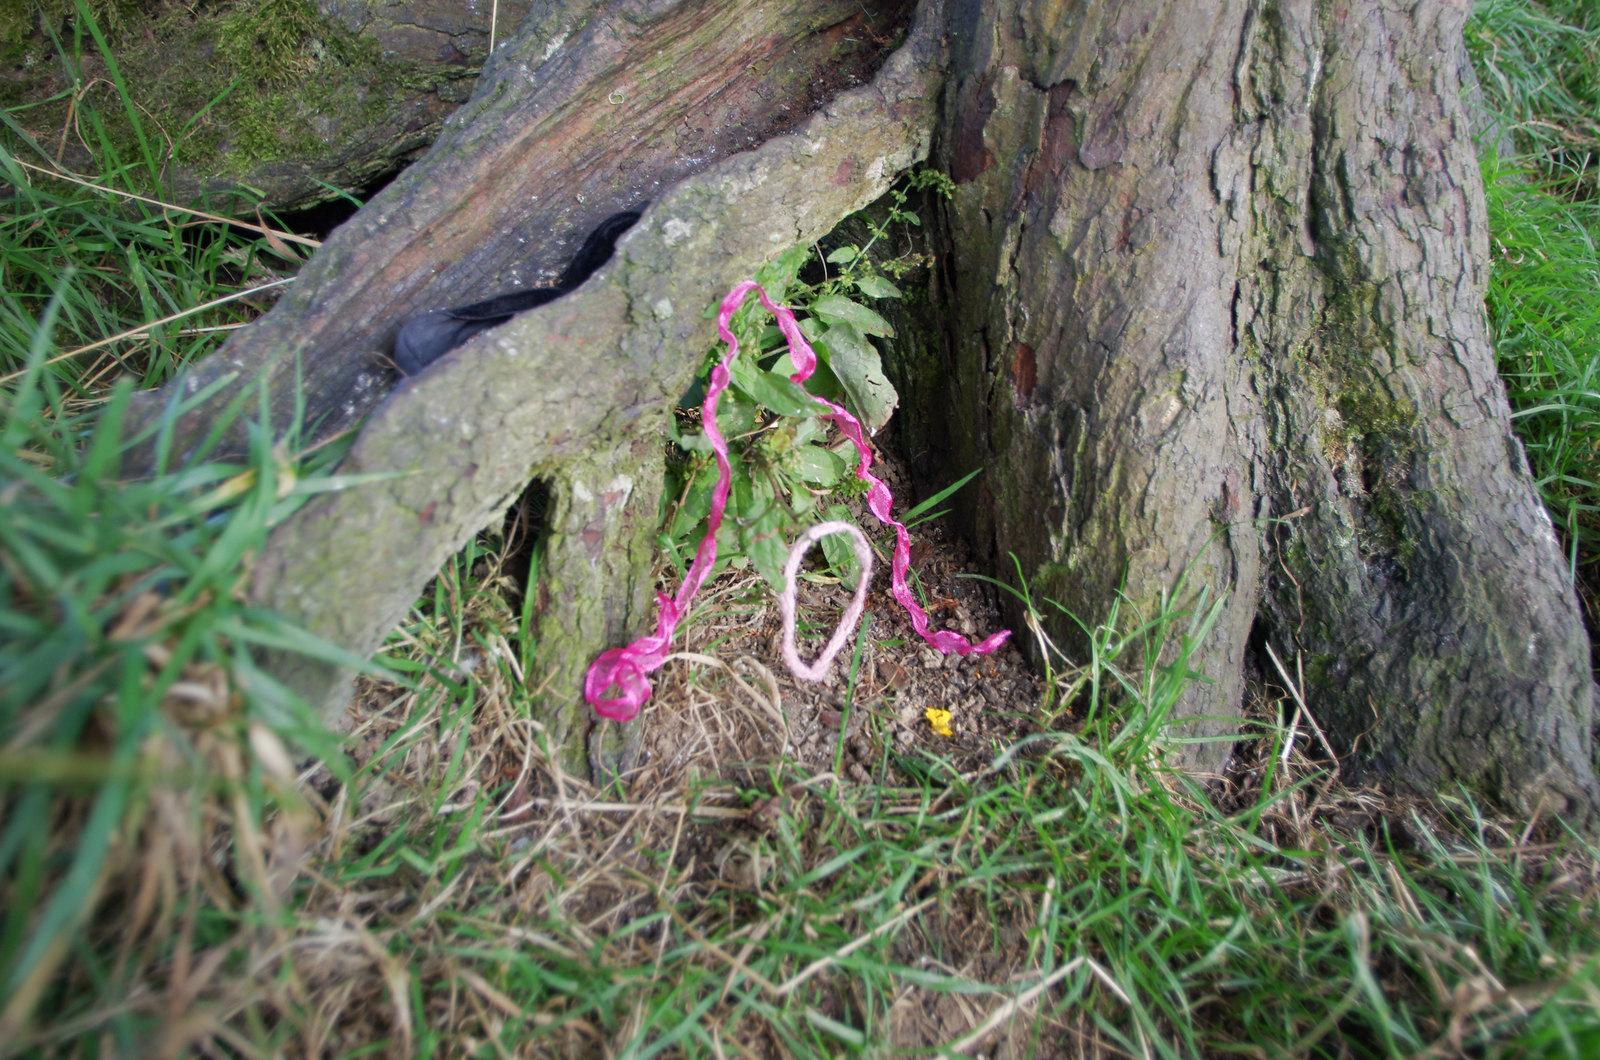 L'arbre à fée de Tara - Carnet de voyage en Irlande